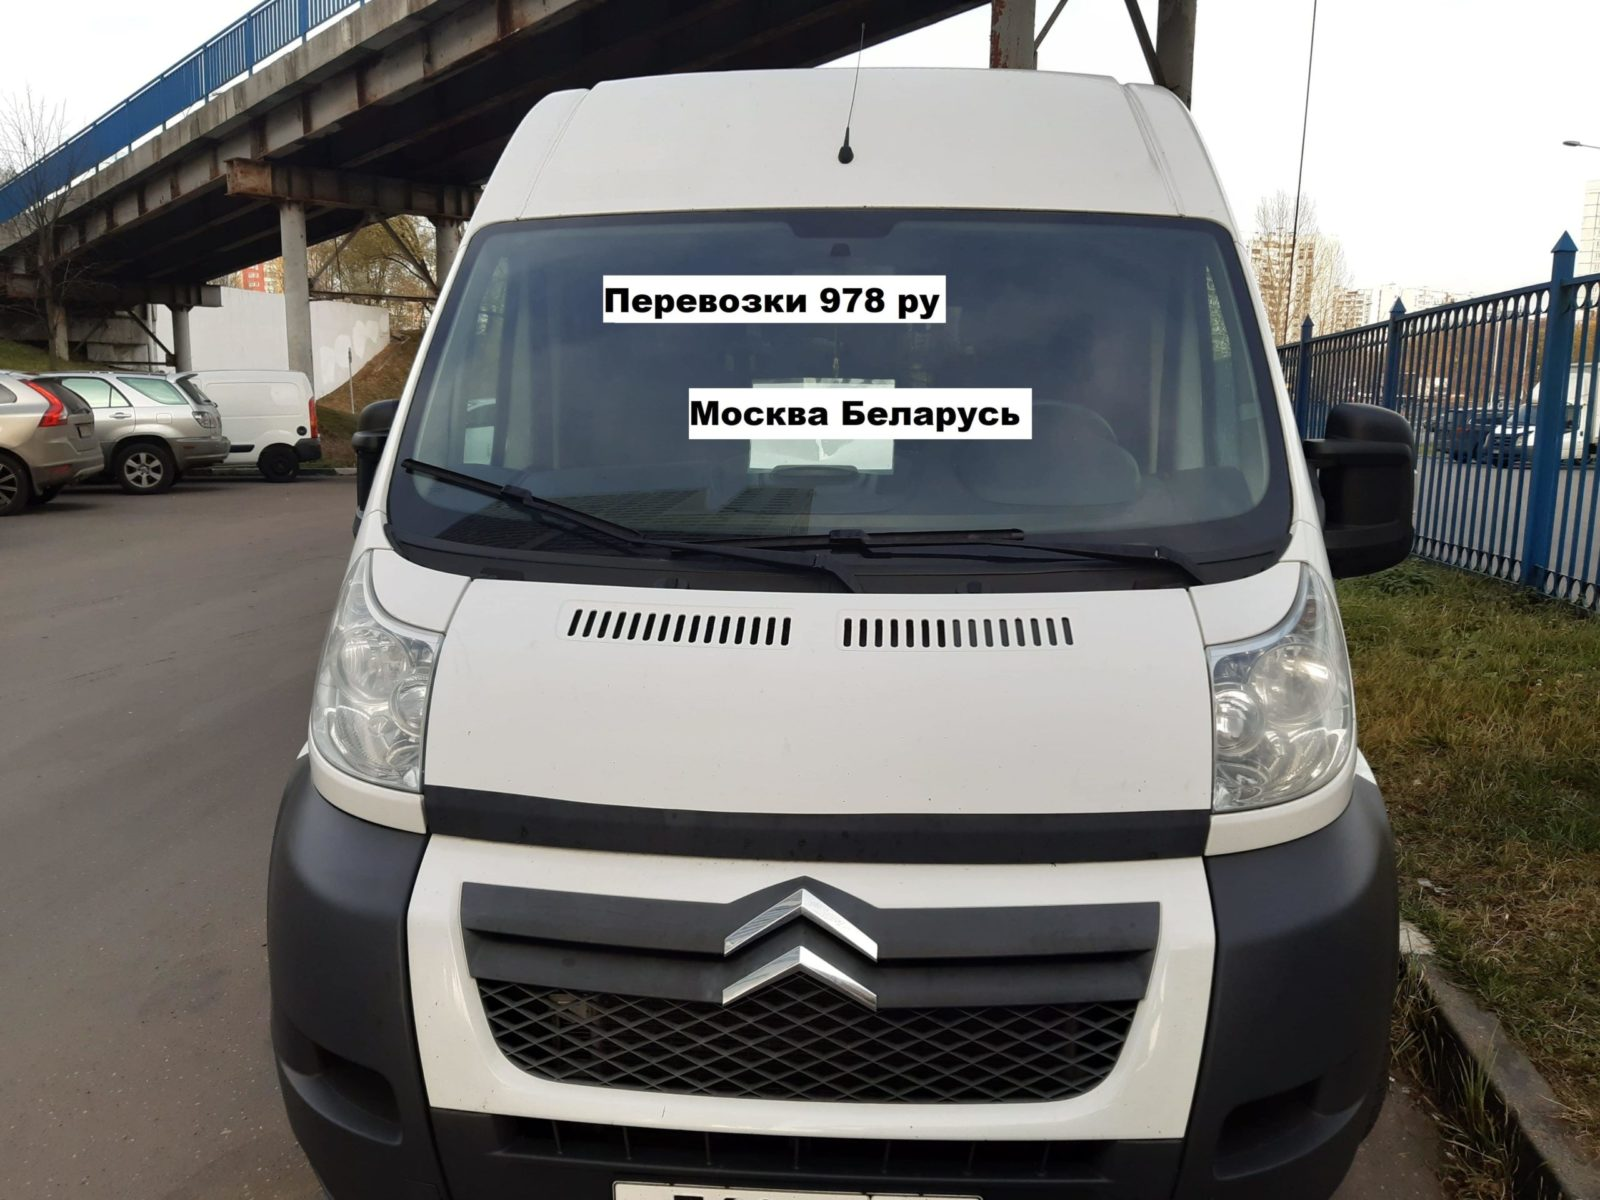 Перевозки Москва Белоруссия - микроавтобус | | «Перевозки 978»